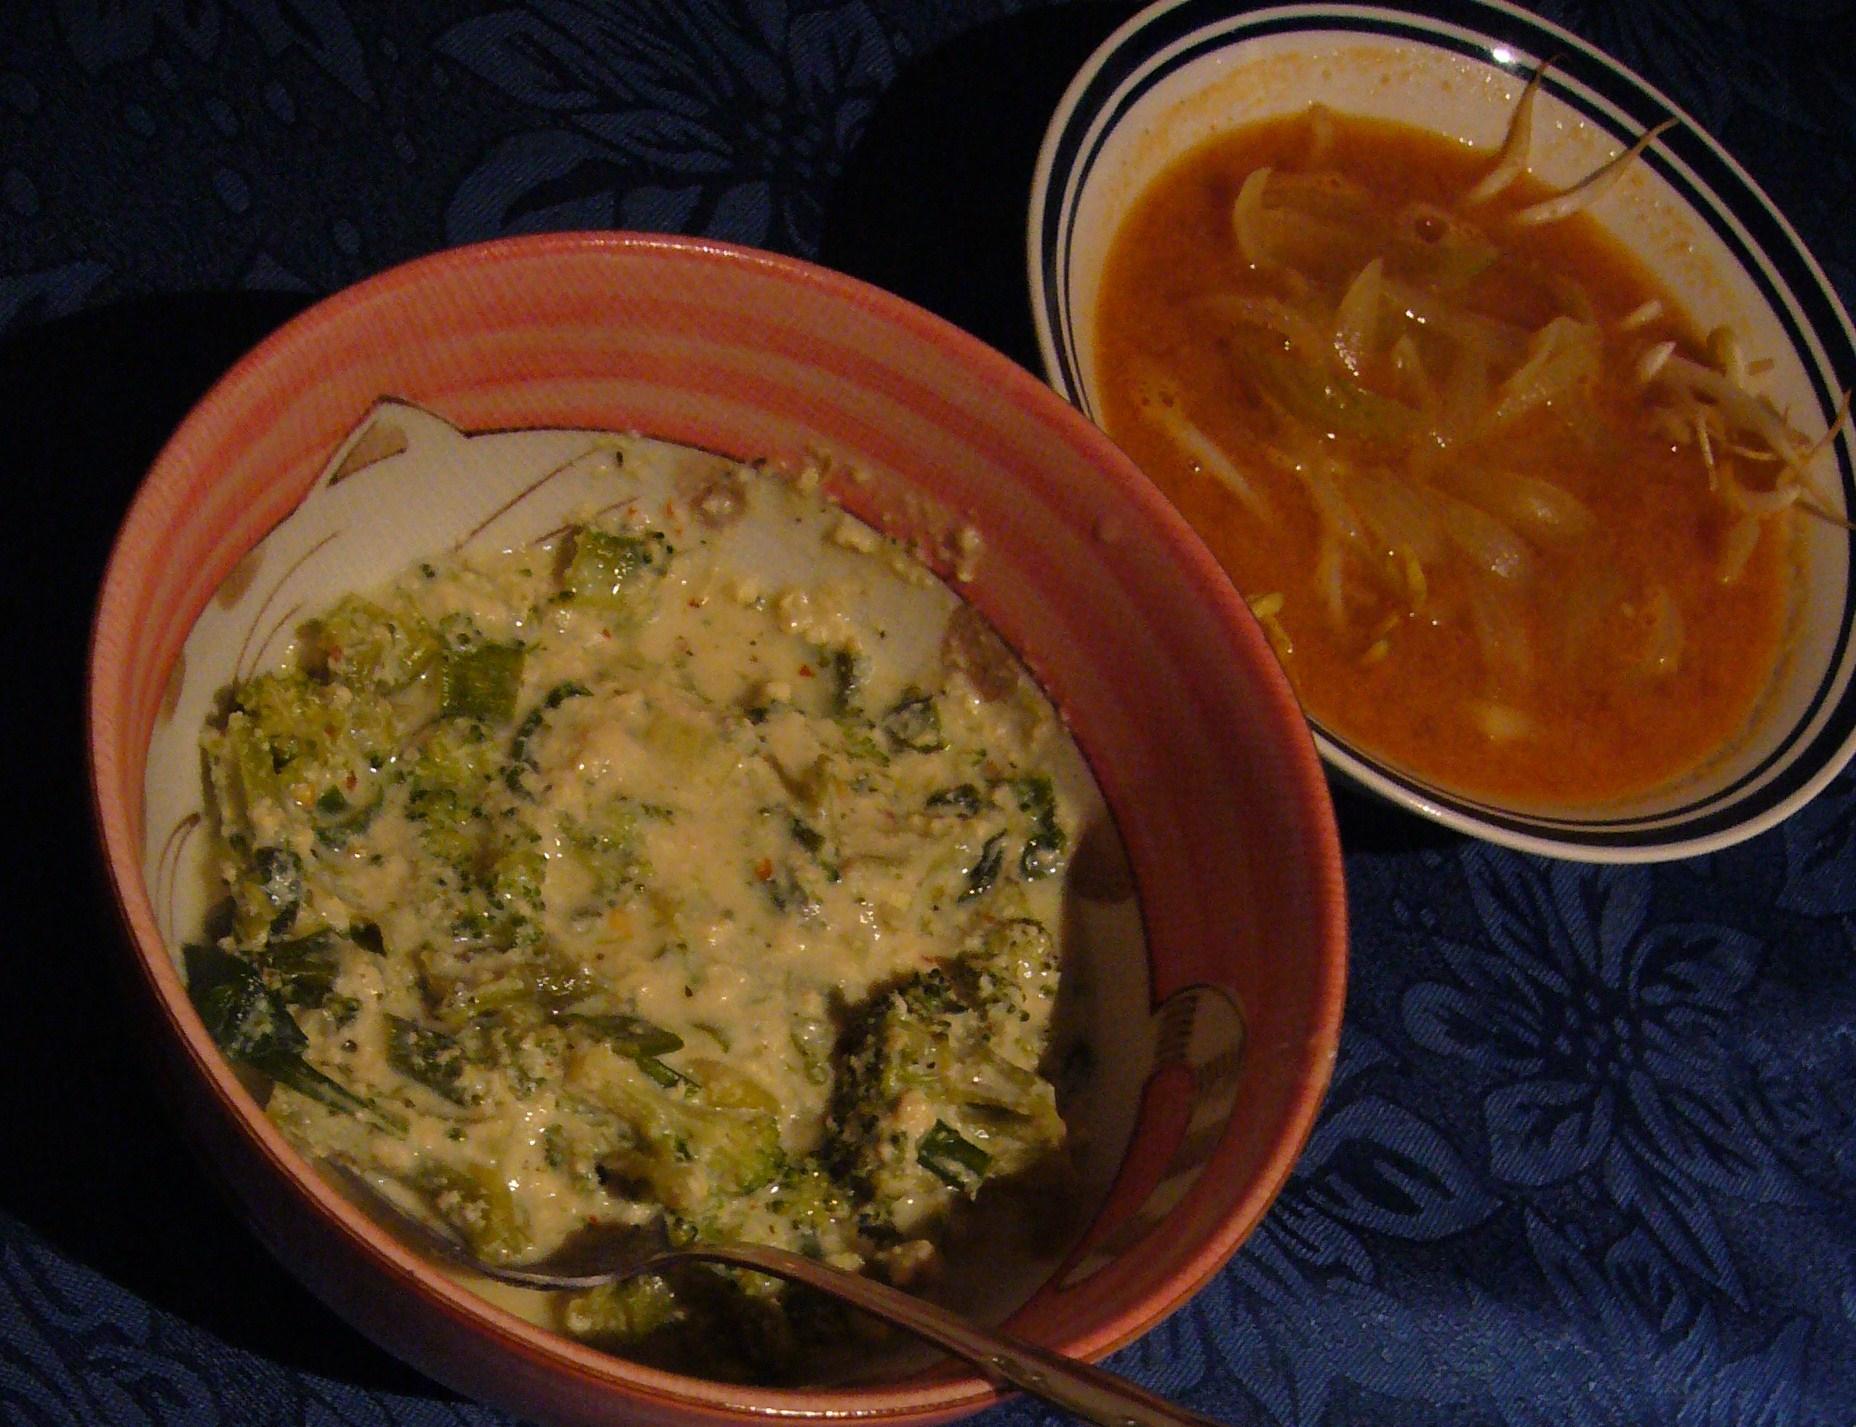 Broccoli with tofu sauce